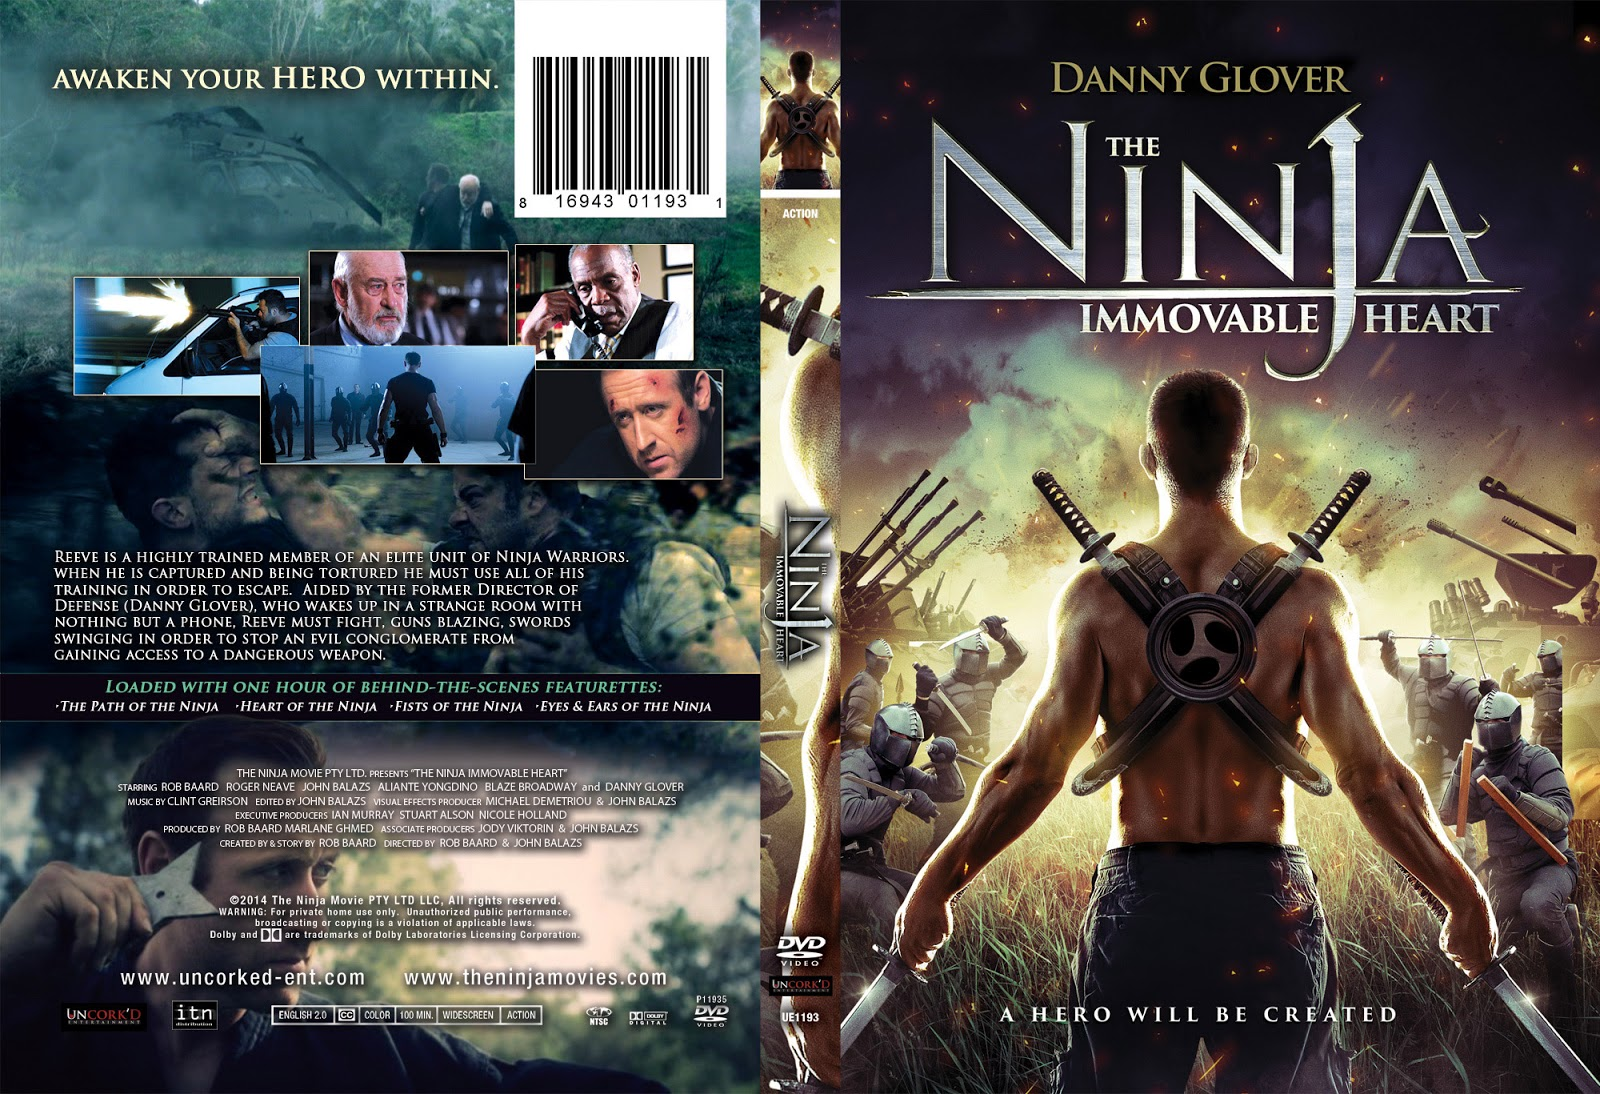 Download Ninja O Guerreiro Imortal DVDRip XviD Dual Áudio ninja immovable heart